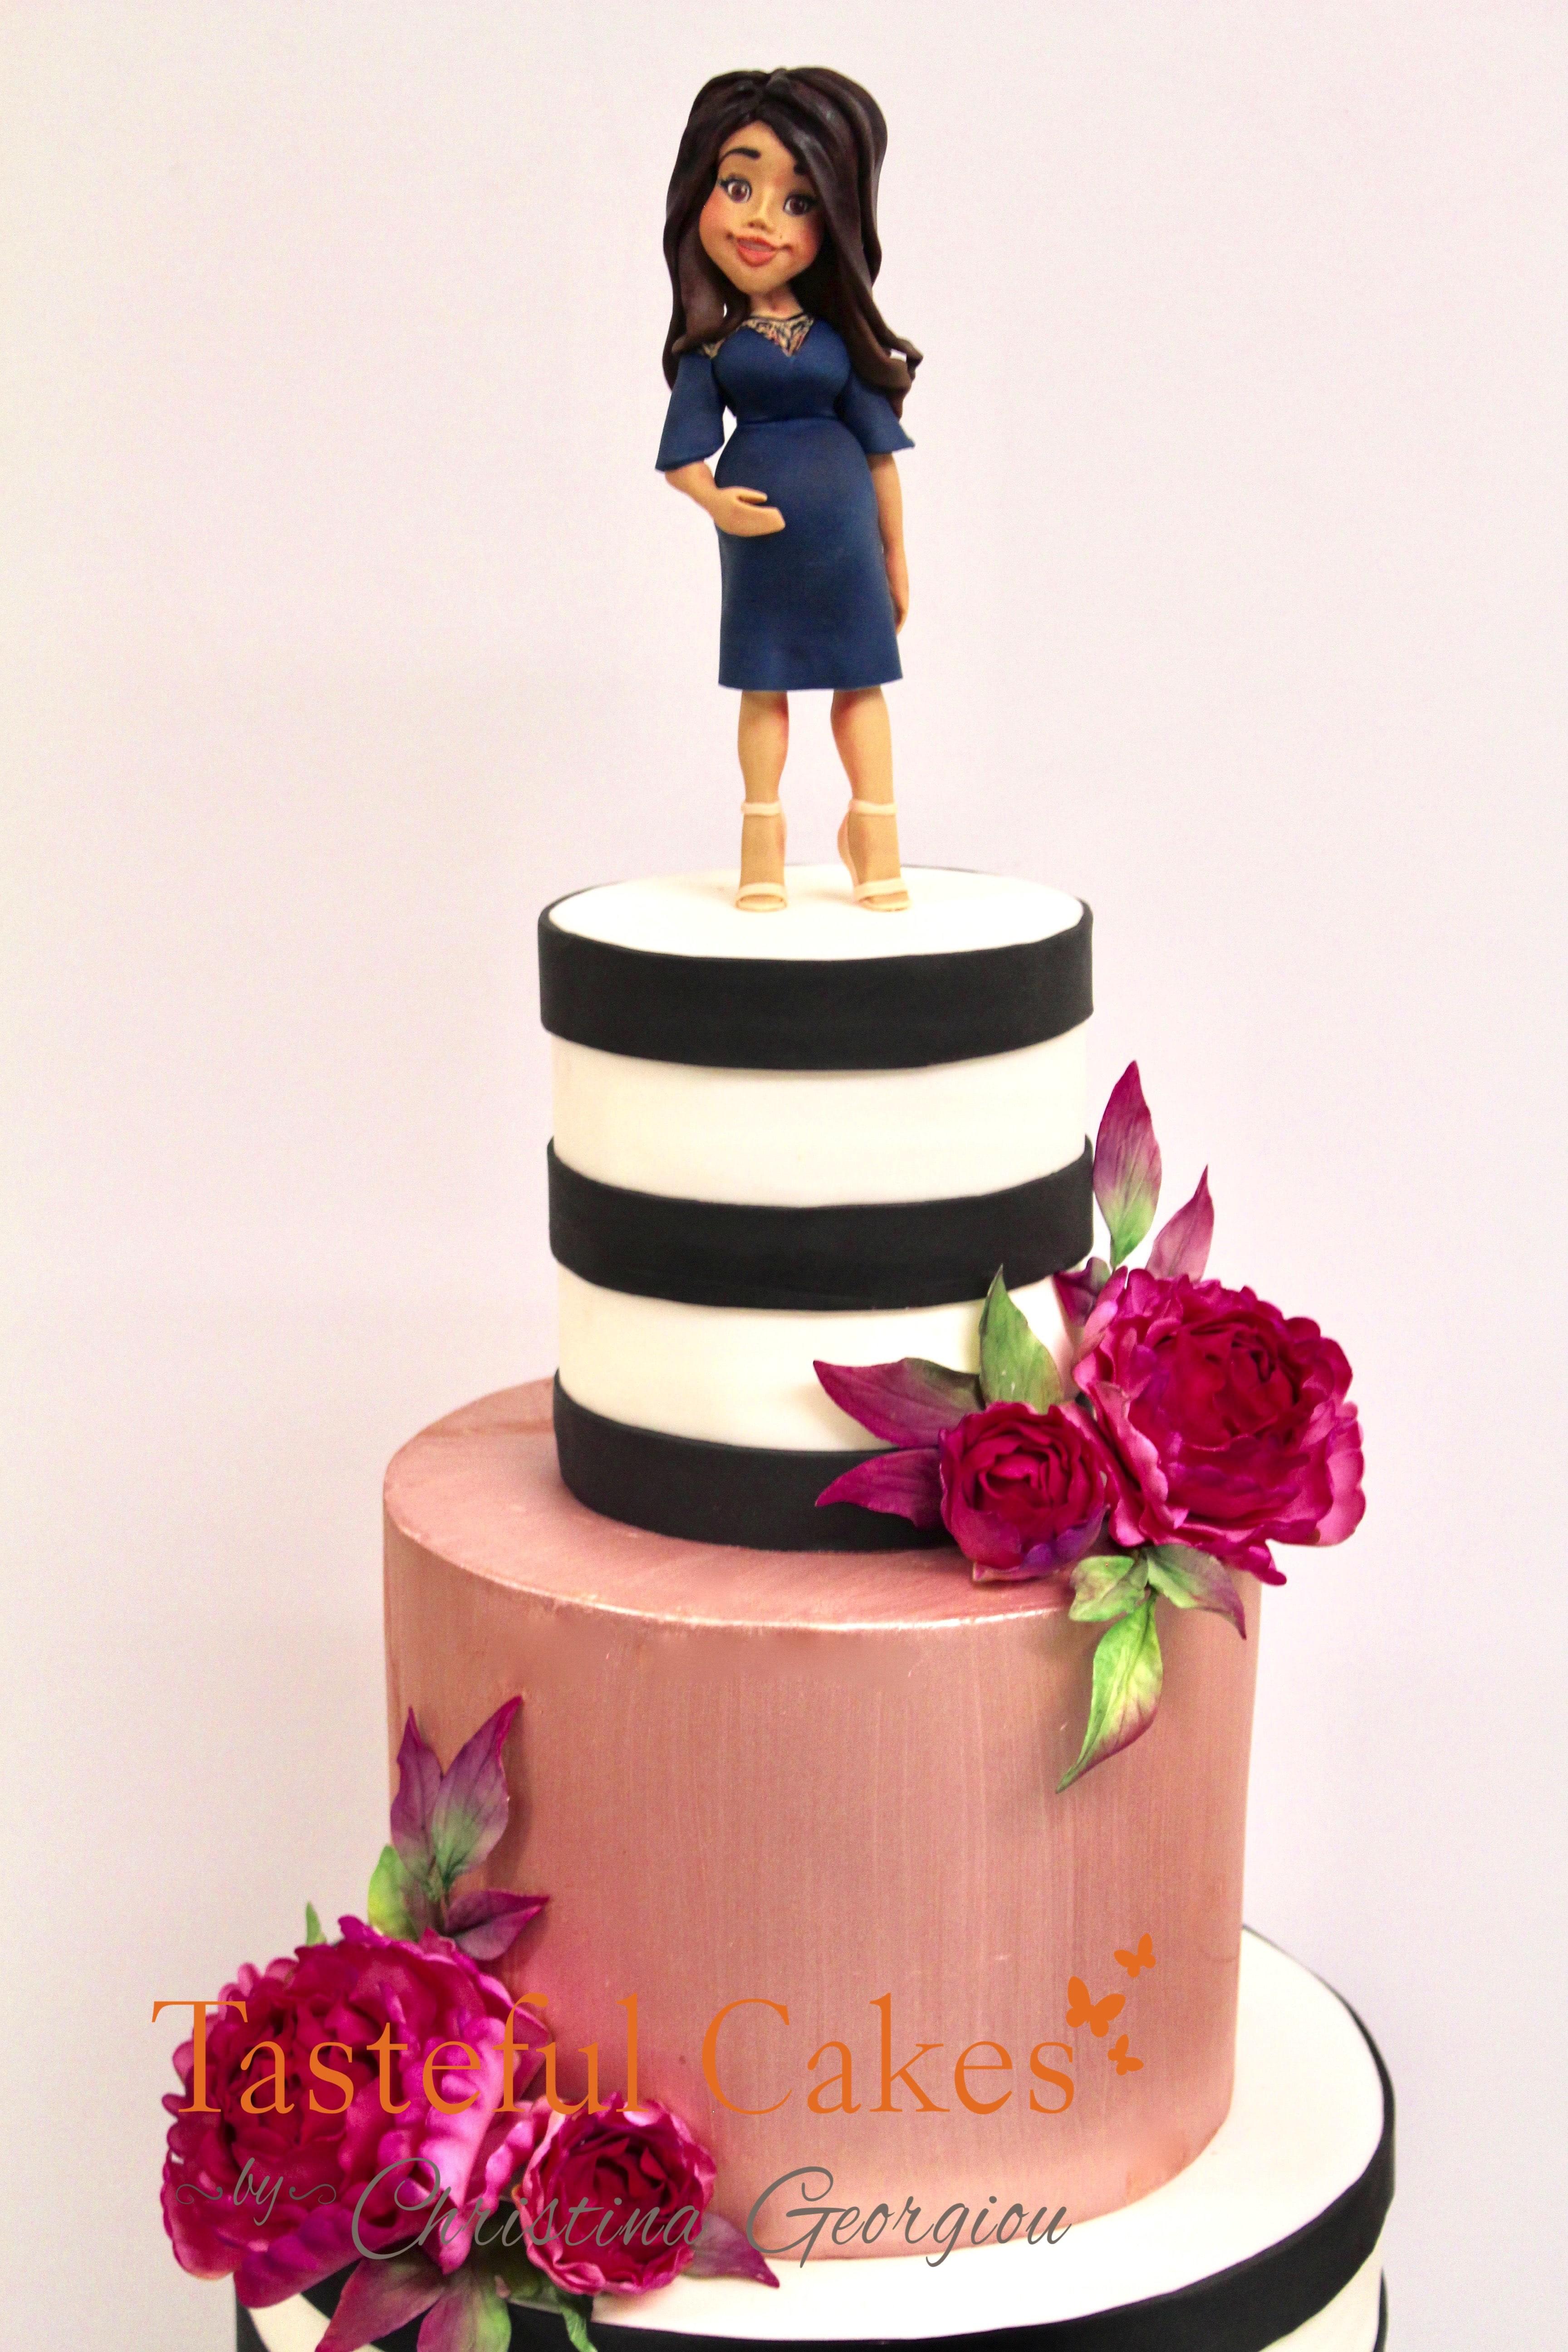 Tasteful Cakes By Christina Georgiou   Rose Gold 40th Birthday Cake